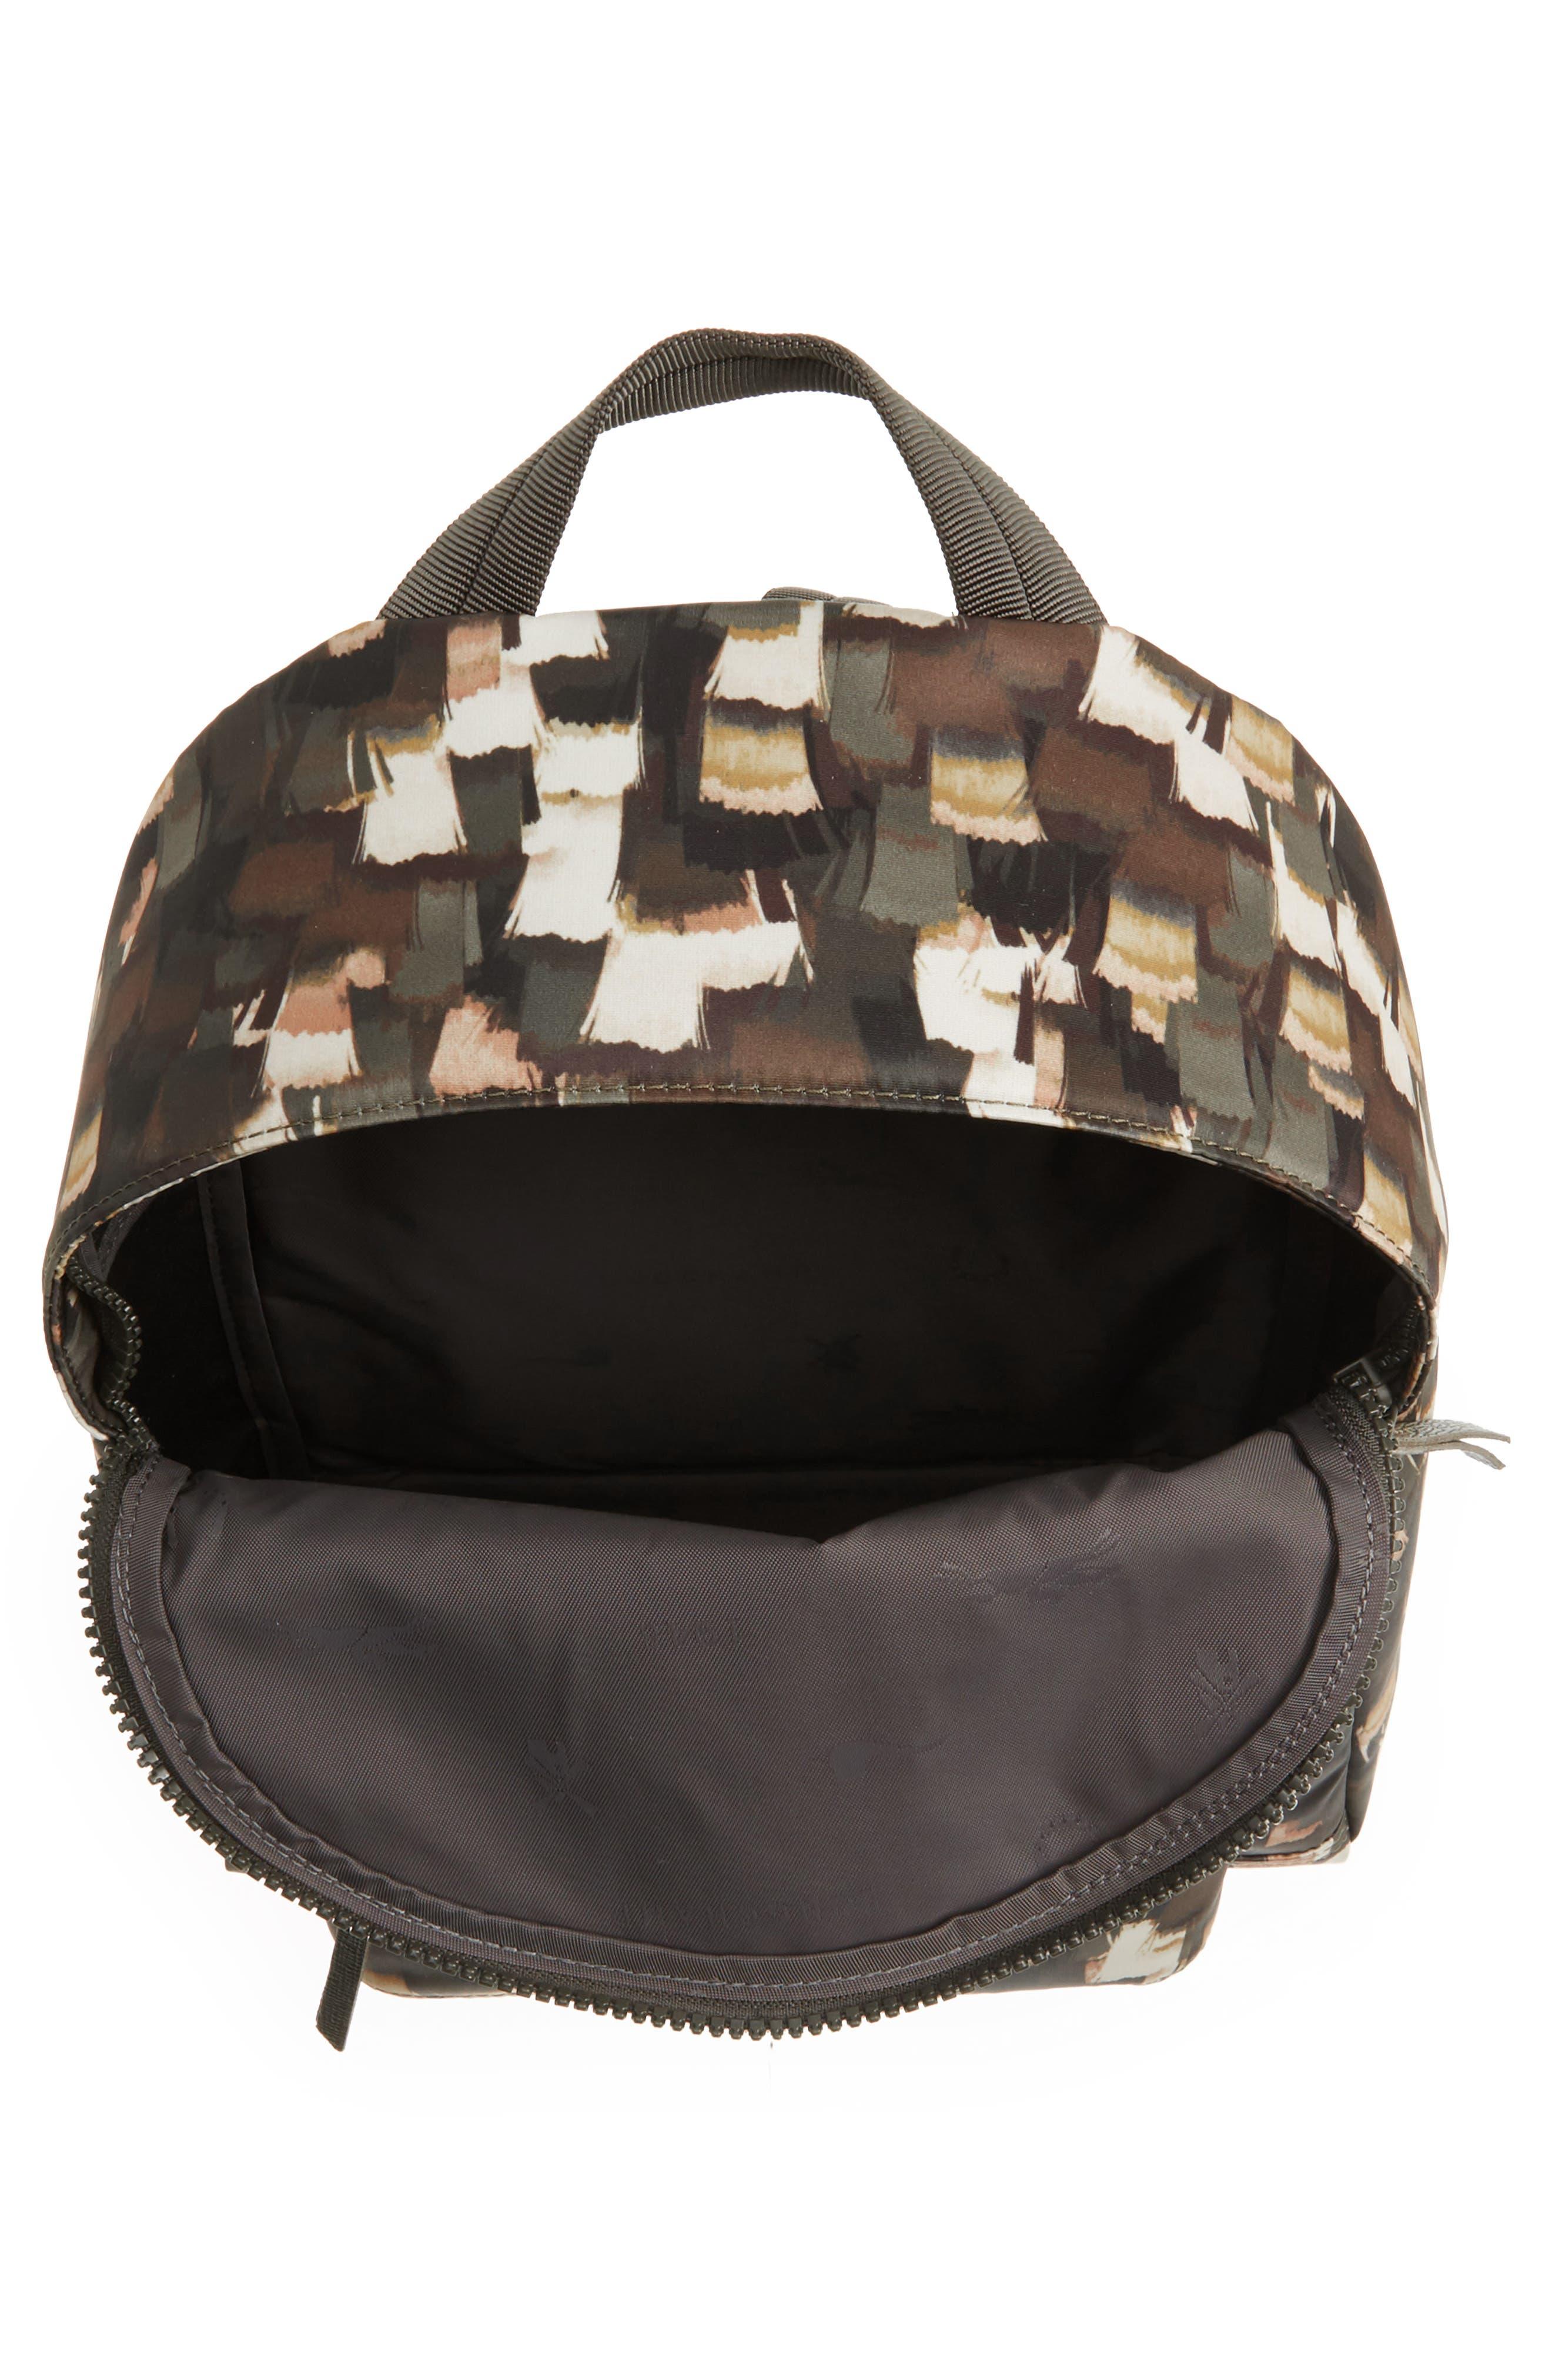 Le Pliage Neo - Vibrations Nylon Backpack,                             Alternate thumbnail 4, color,                             300